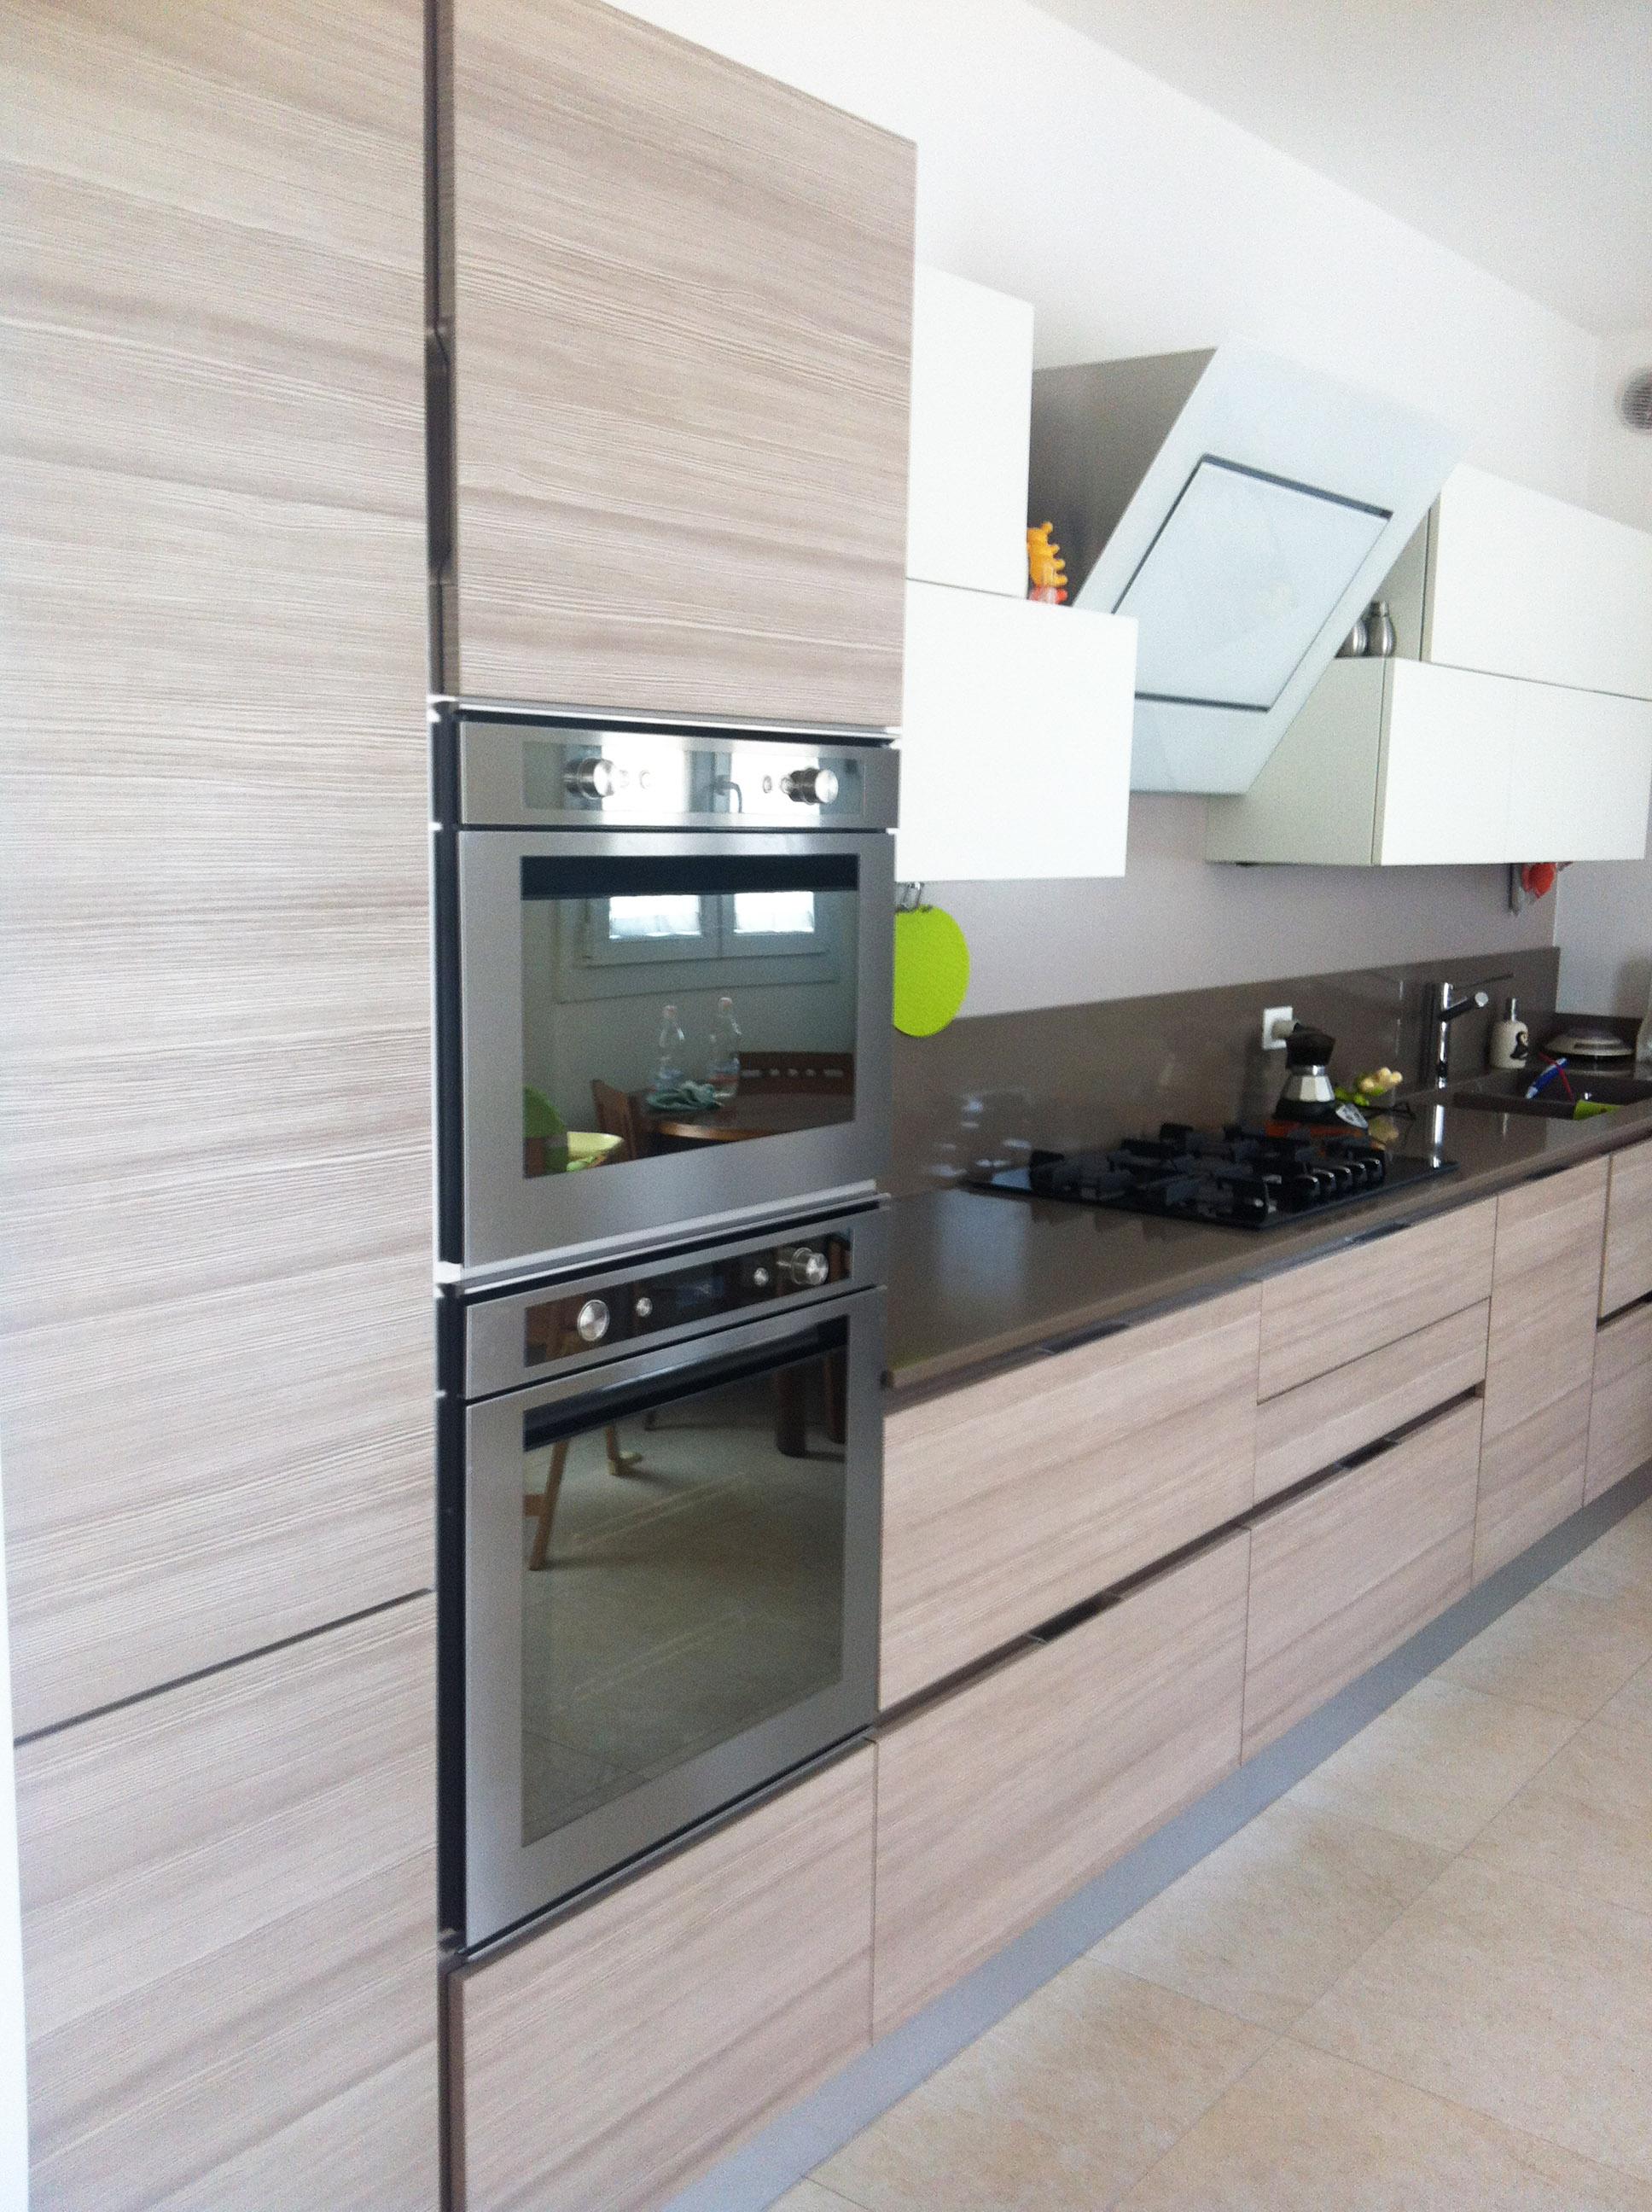 Cucina Veneta Cucina - Arredamenti Perinti Antonio srl